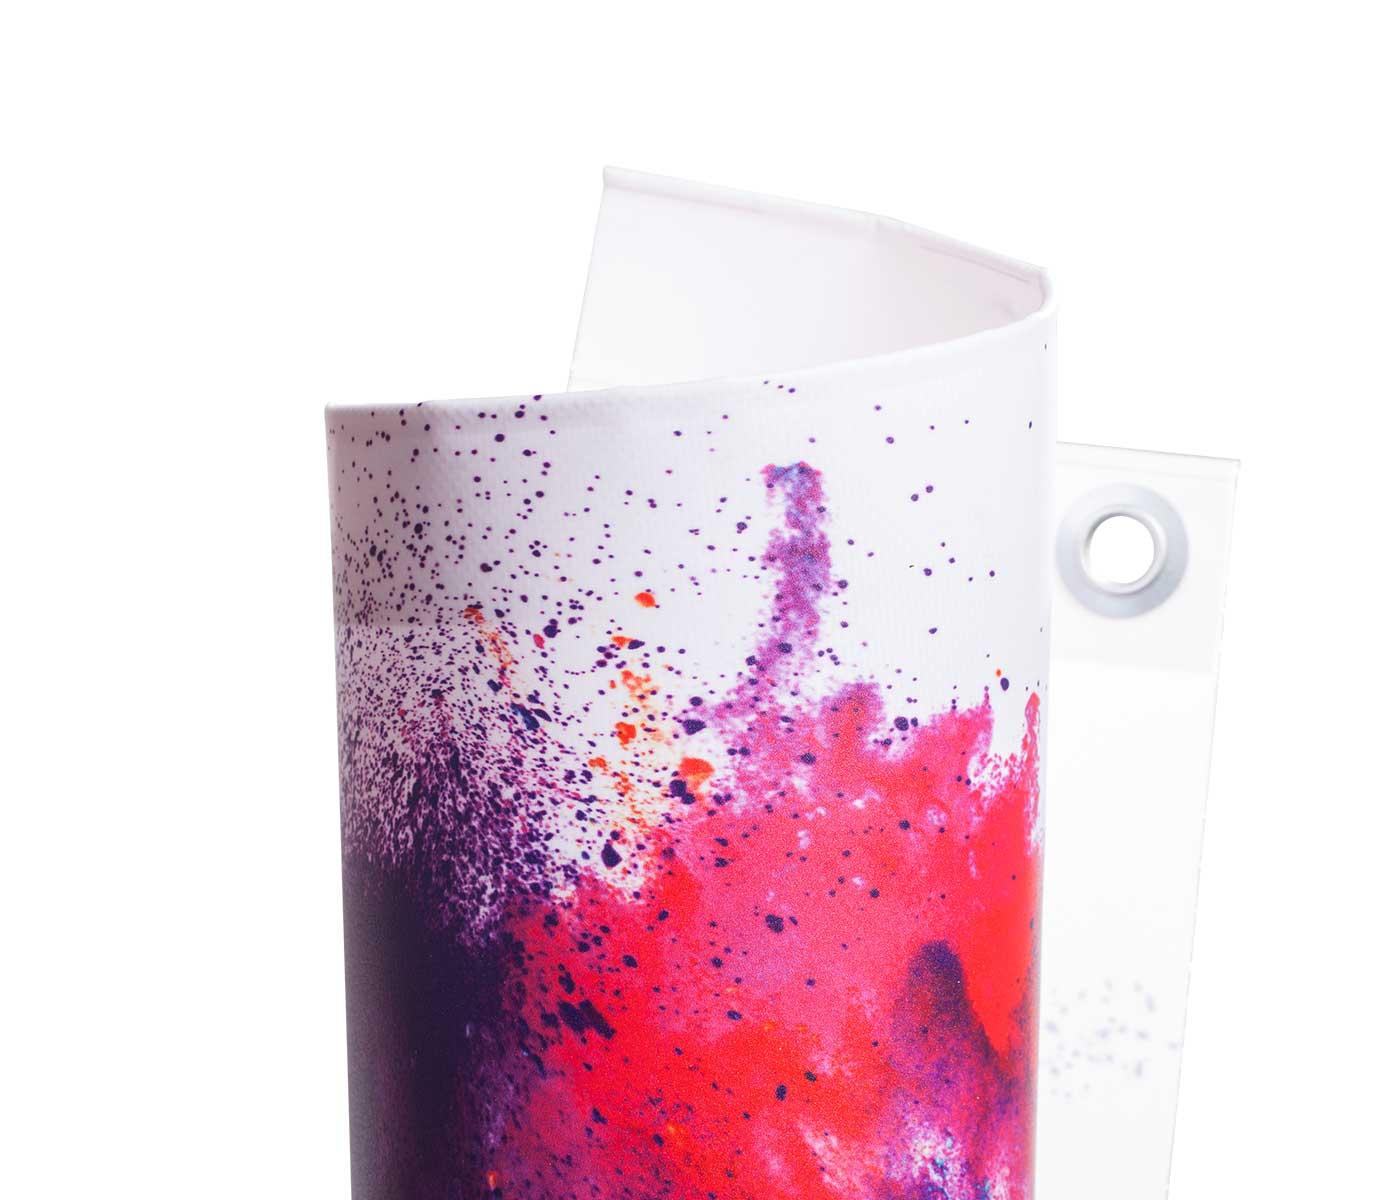 Produktbild Detailaufnahme PVC Backlight Material